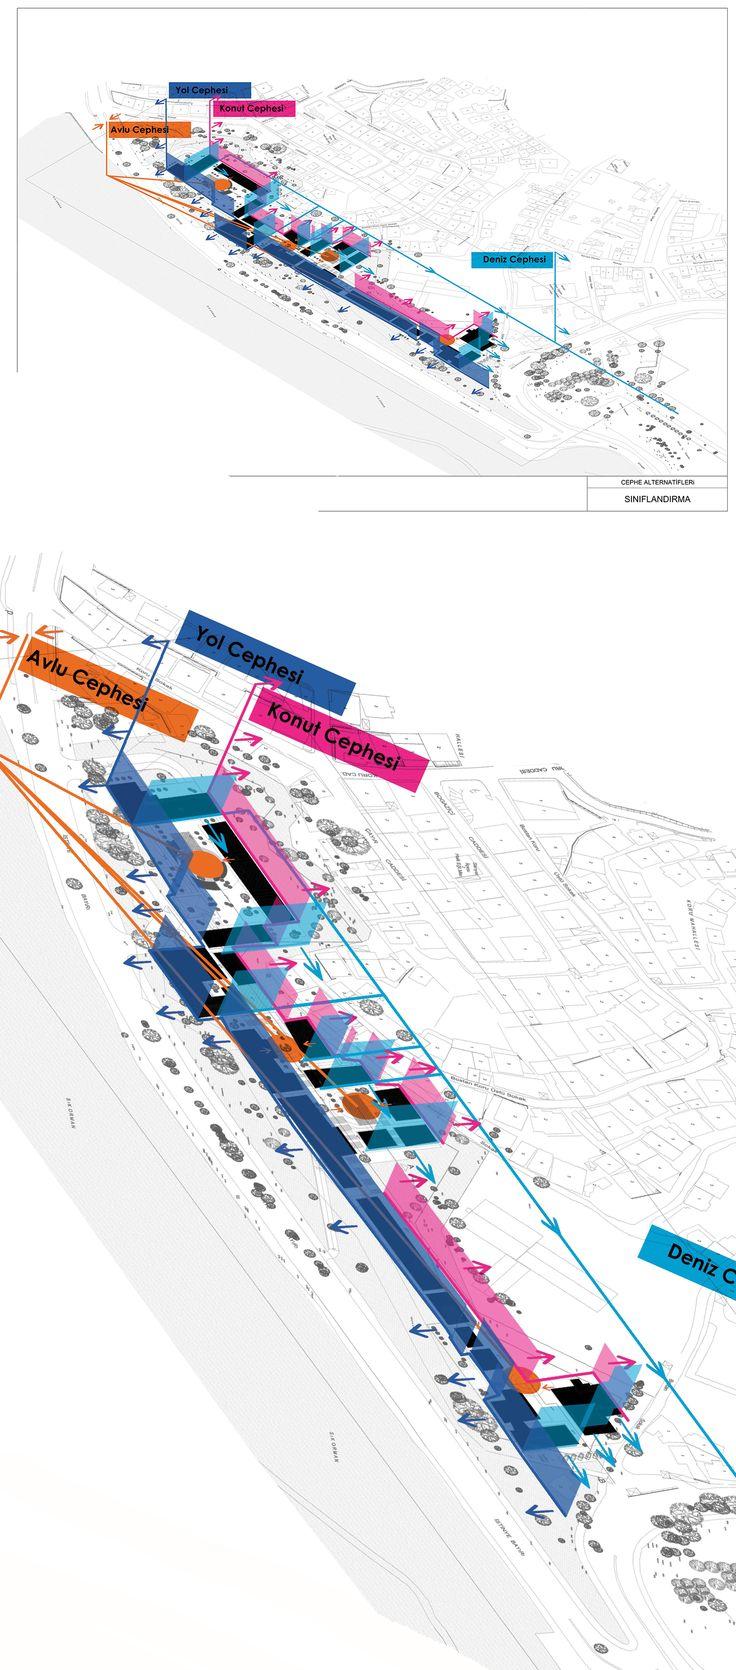 #gokhanavcioglu #gadarchitecture #gadfoundation #architecture